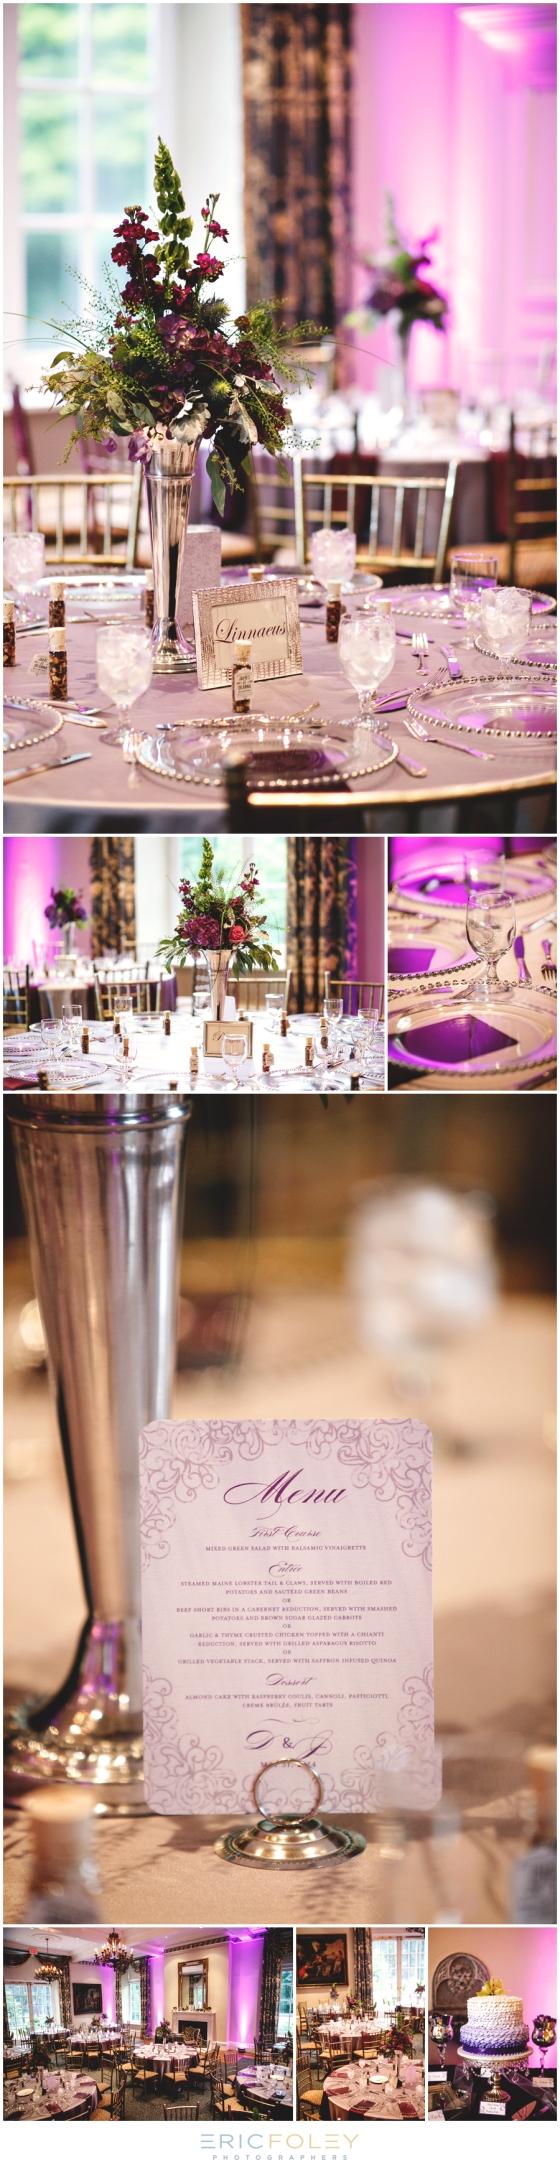 0016_Wadsworth-Mansion-Weddings_Eric-Foley-Photography_DJ